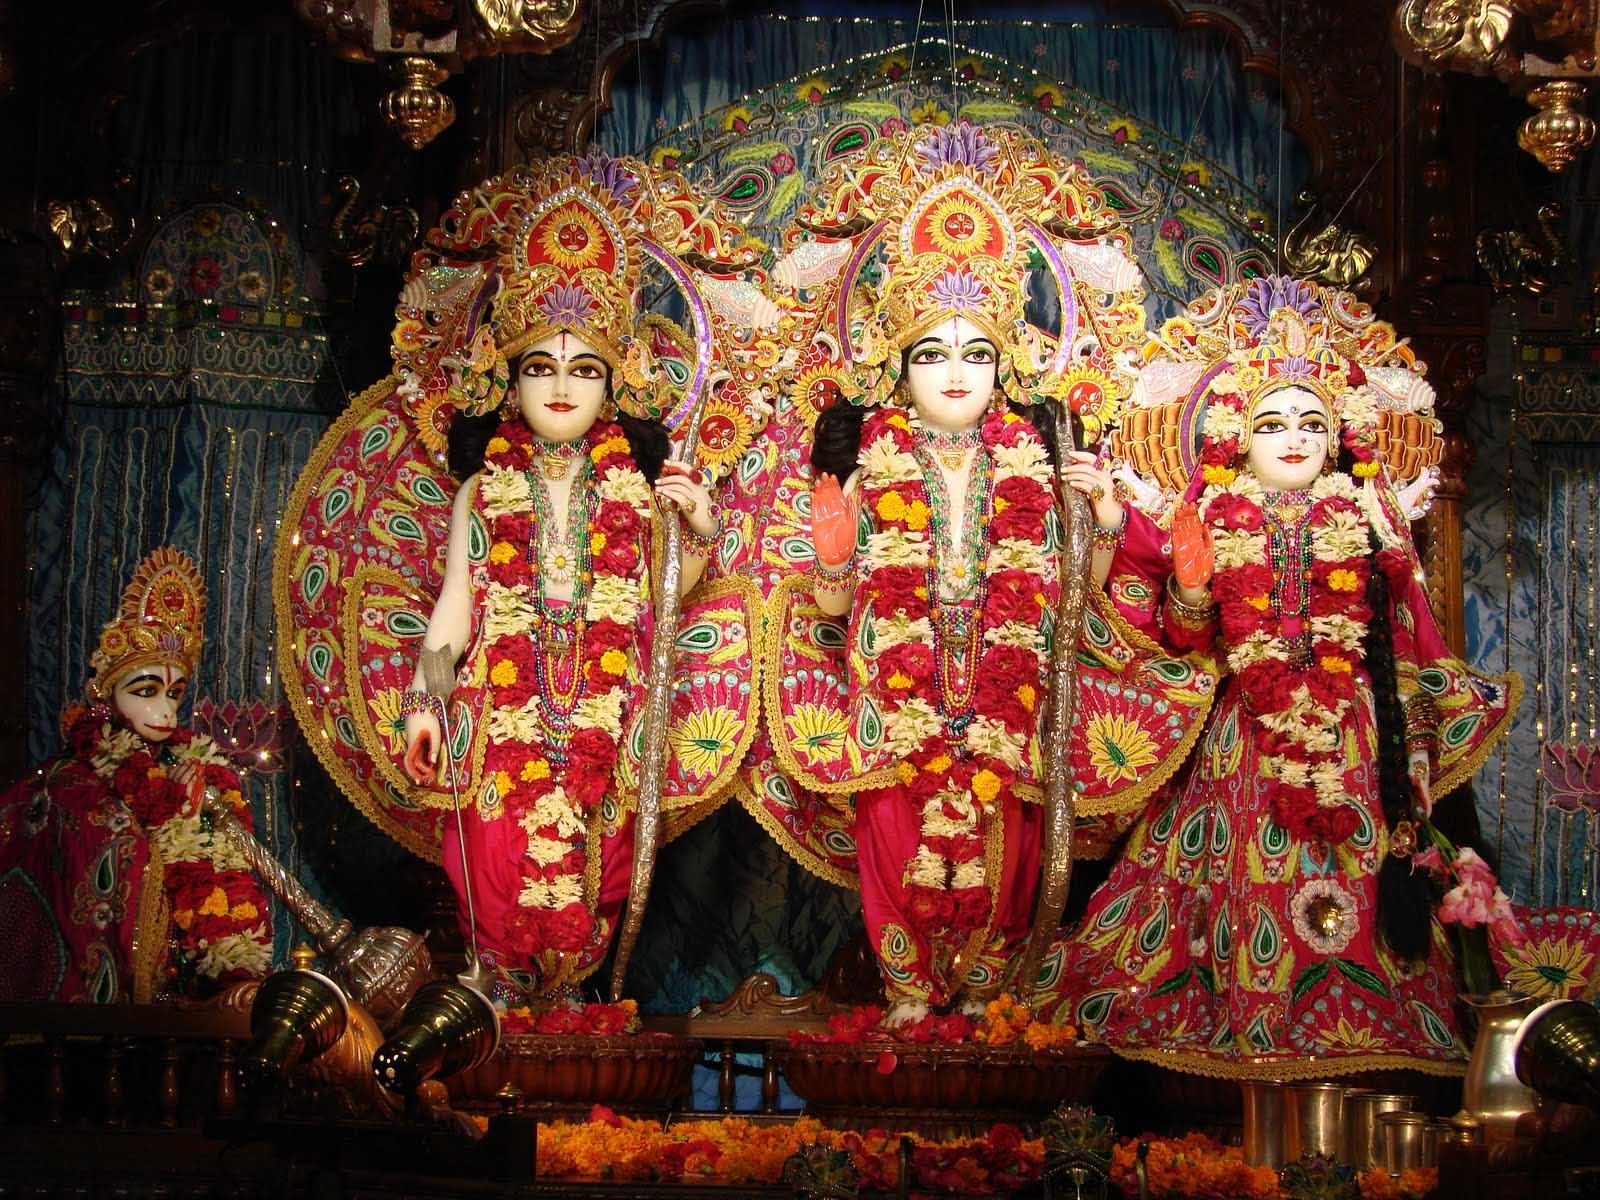 wallpaper Navratri wallpapers Ganesh picture Hindu God Ram 1600x1200